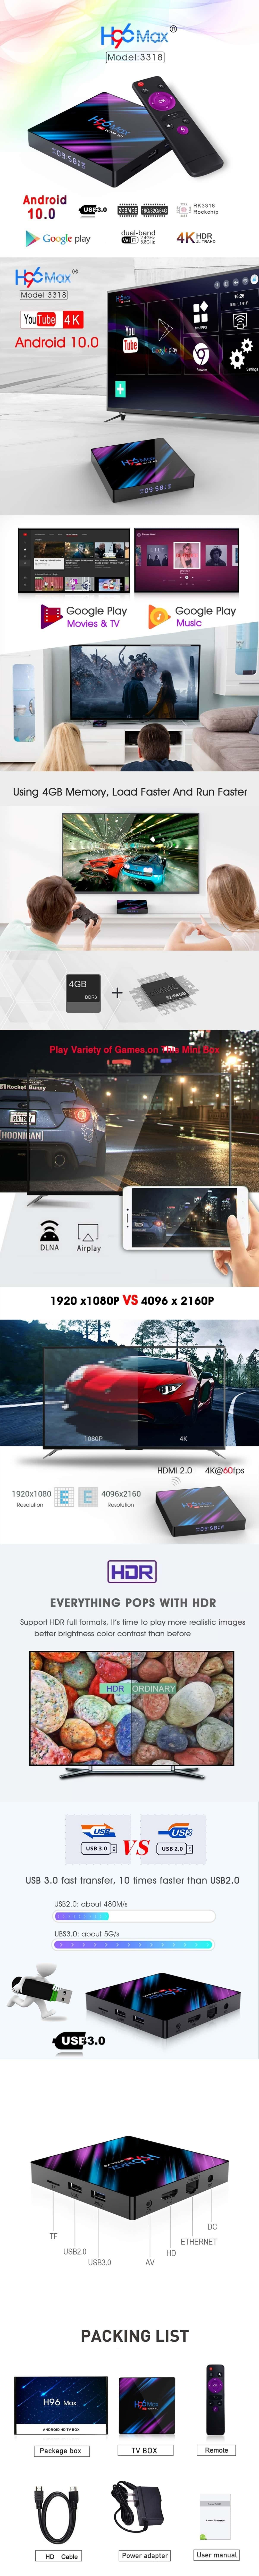 H96-MAX-RK3318-Android-10-4GBcc270ca34b176ec0.jpg